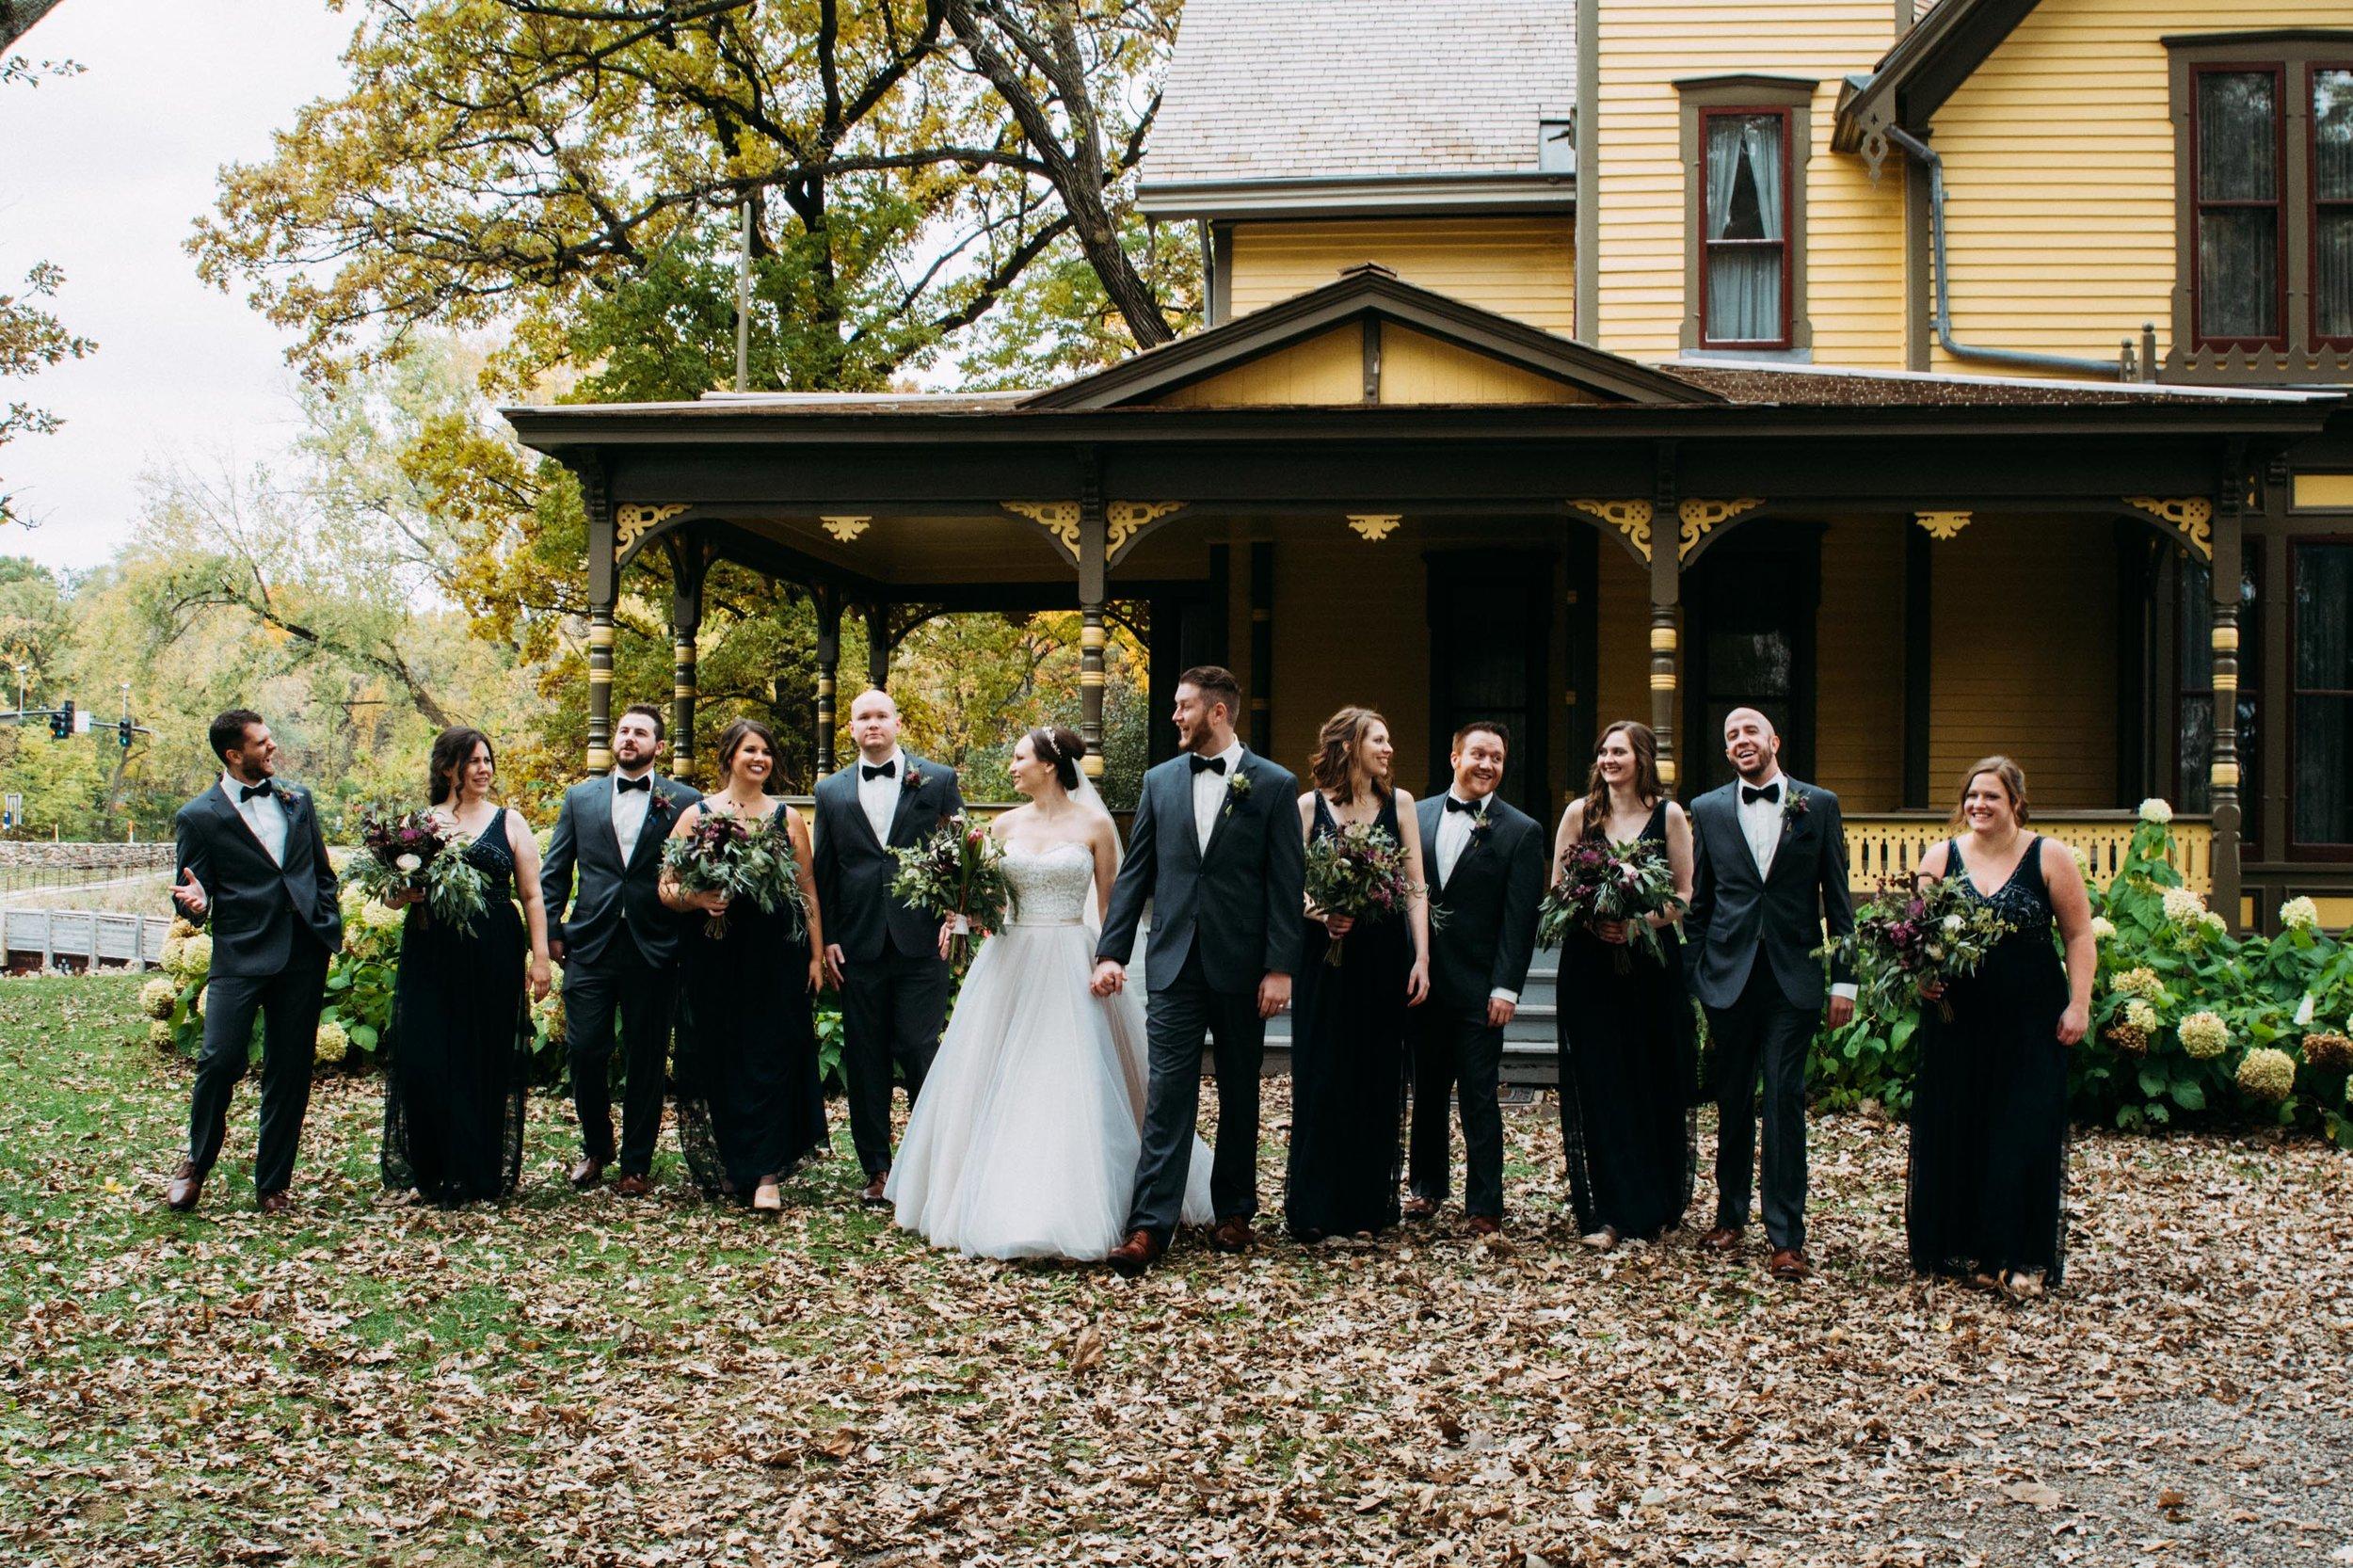 18-Sara_Tom_Wedding_Party_Portraits_Minneapolis_Wedding.jpg